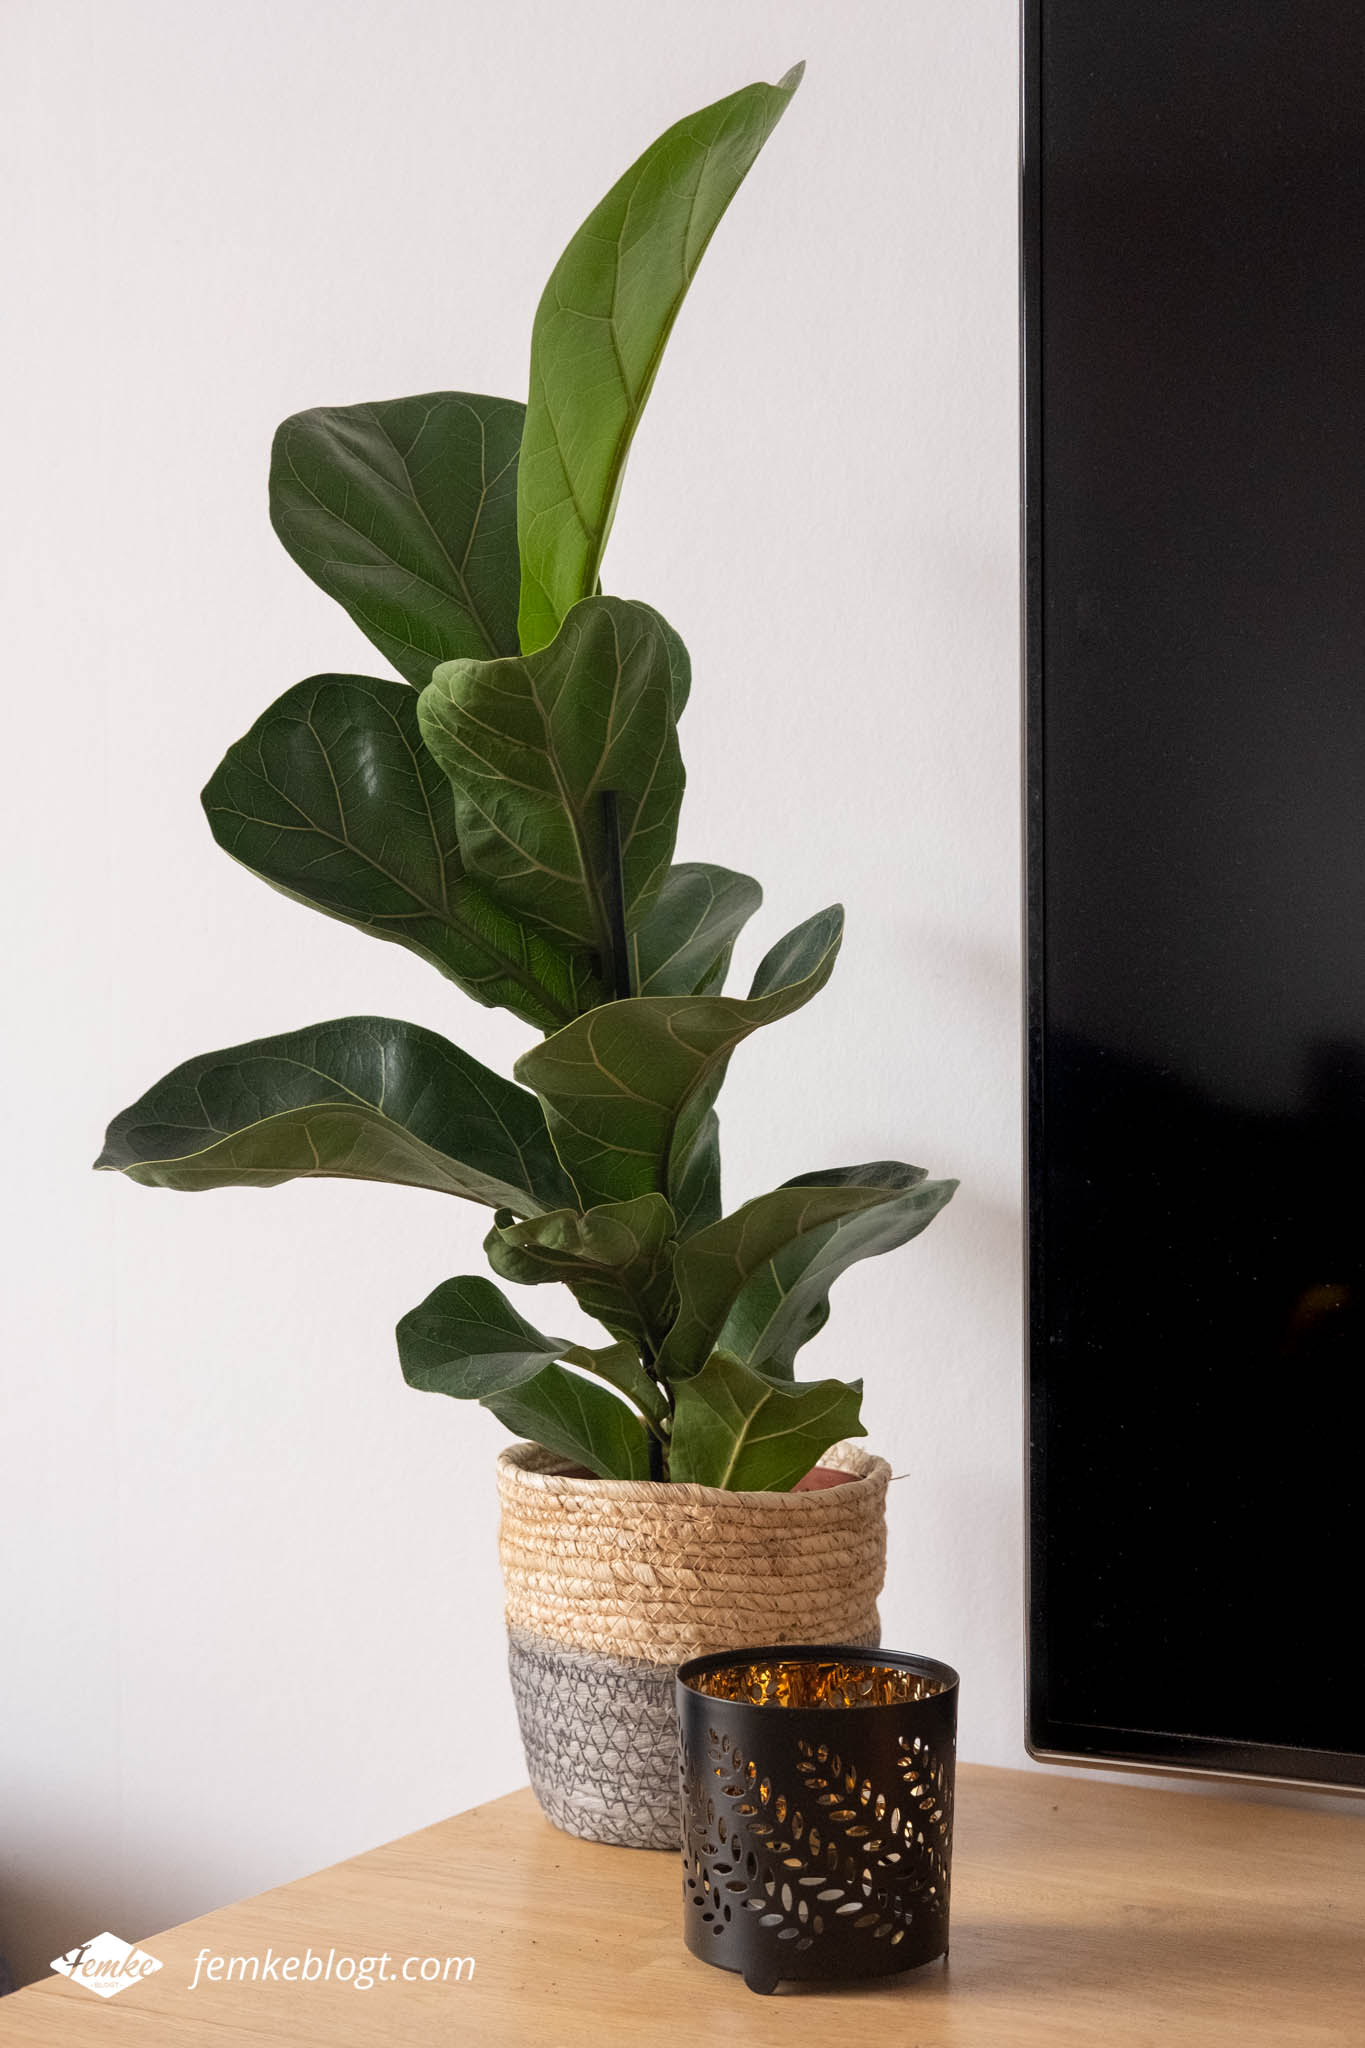 Kleine planten in huis - Ficus Lyrata (vioolbladplant)